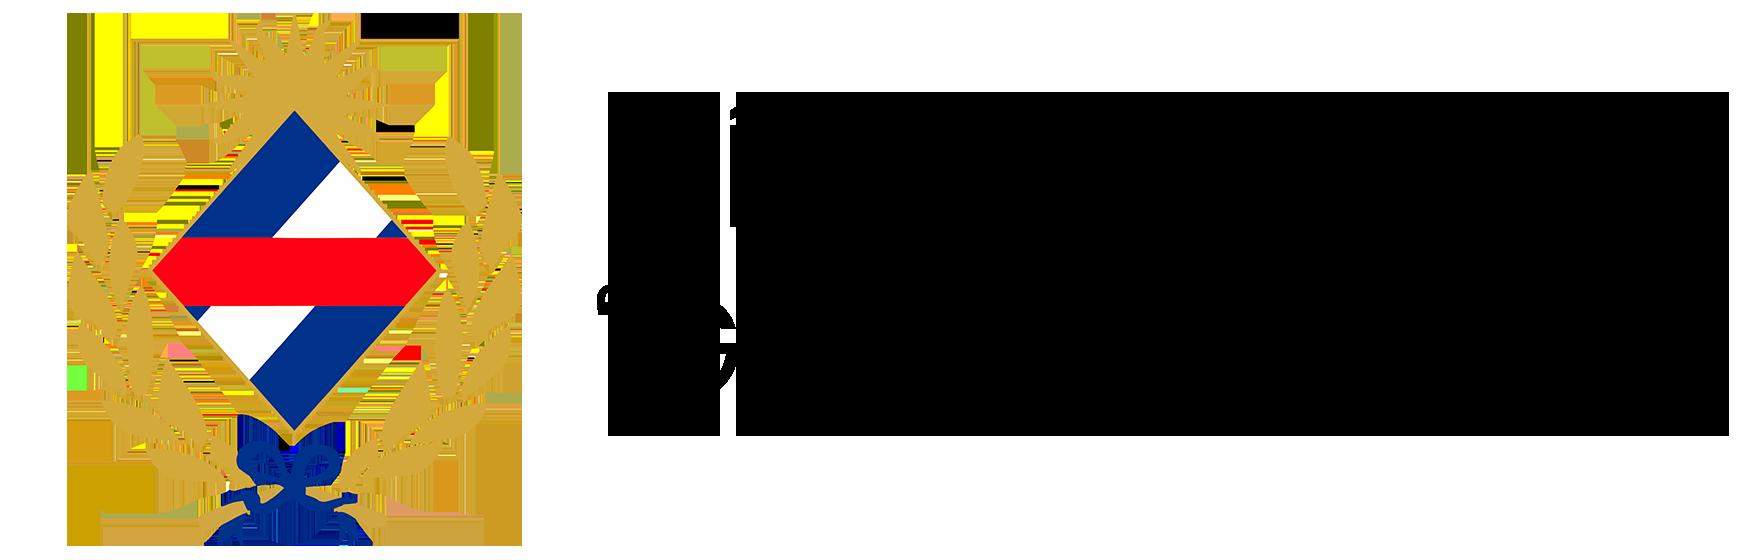 Círculo Militar